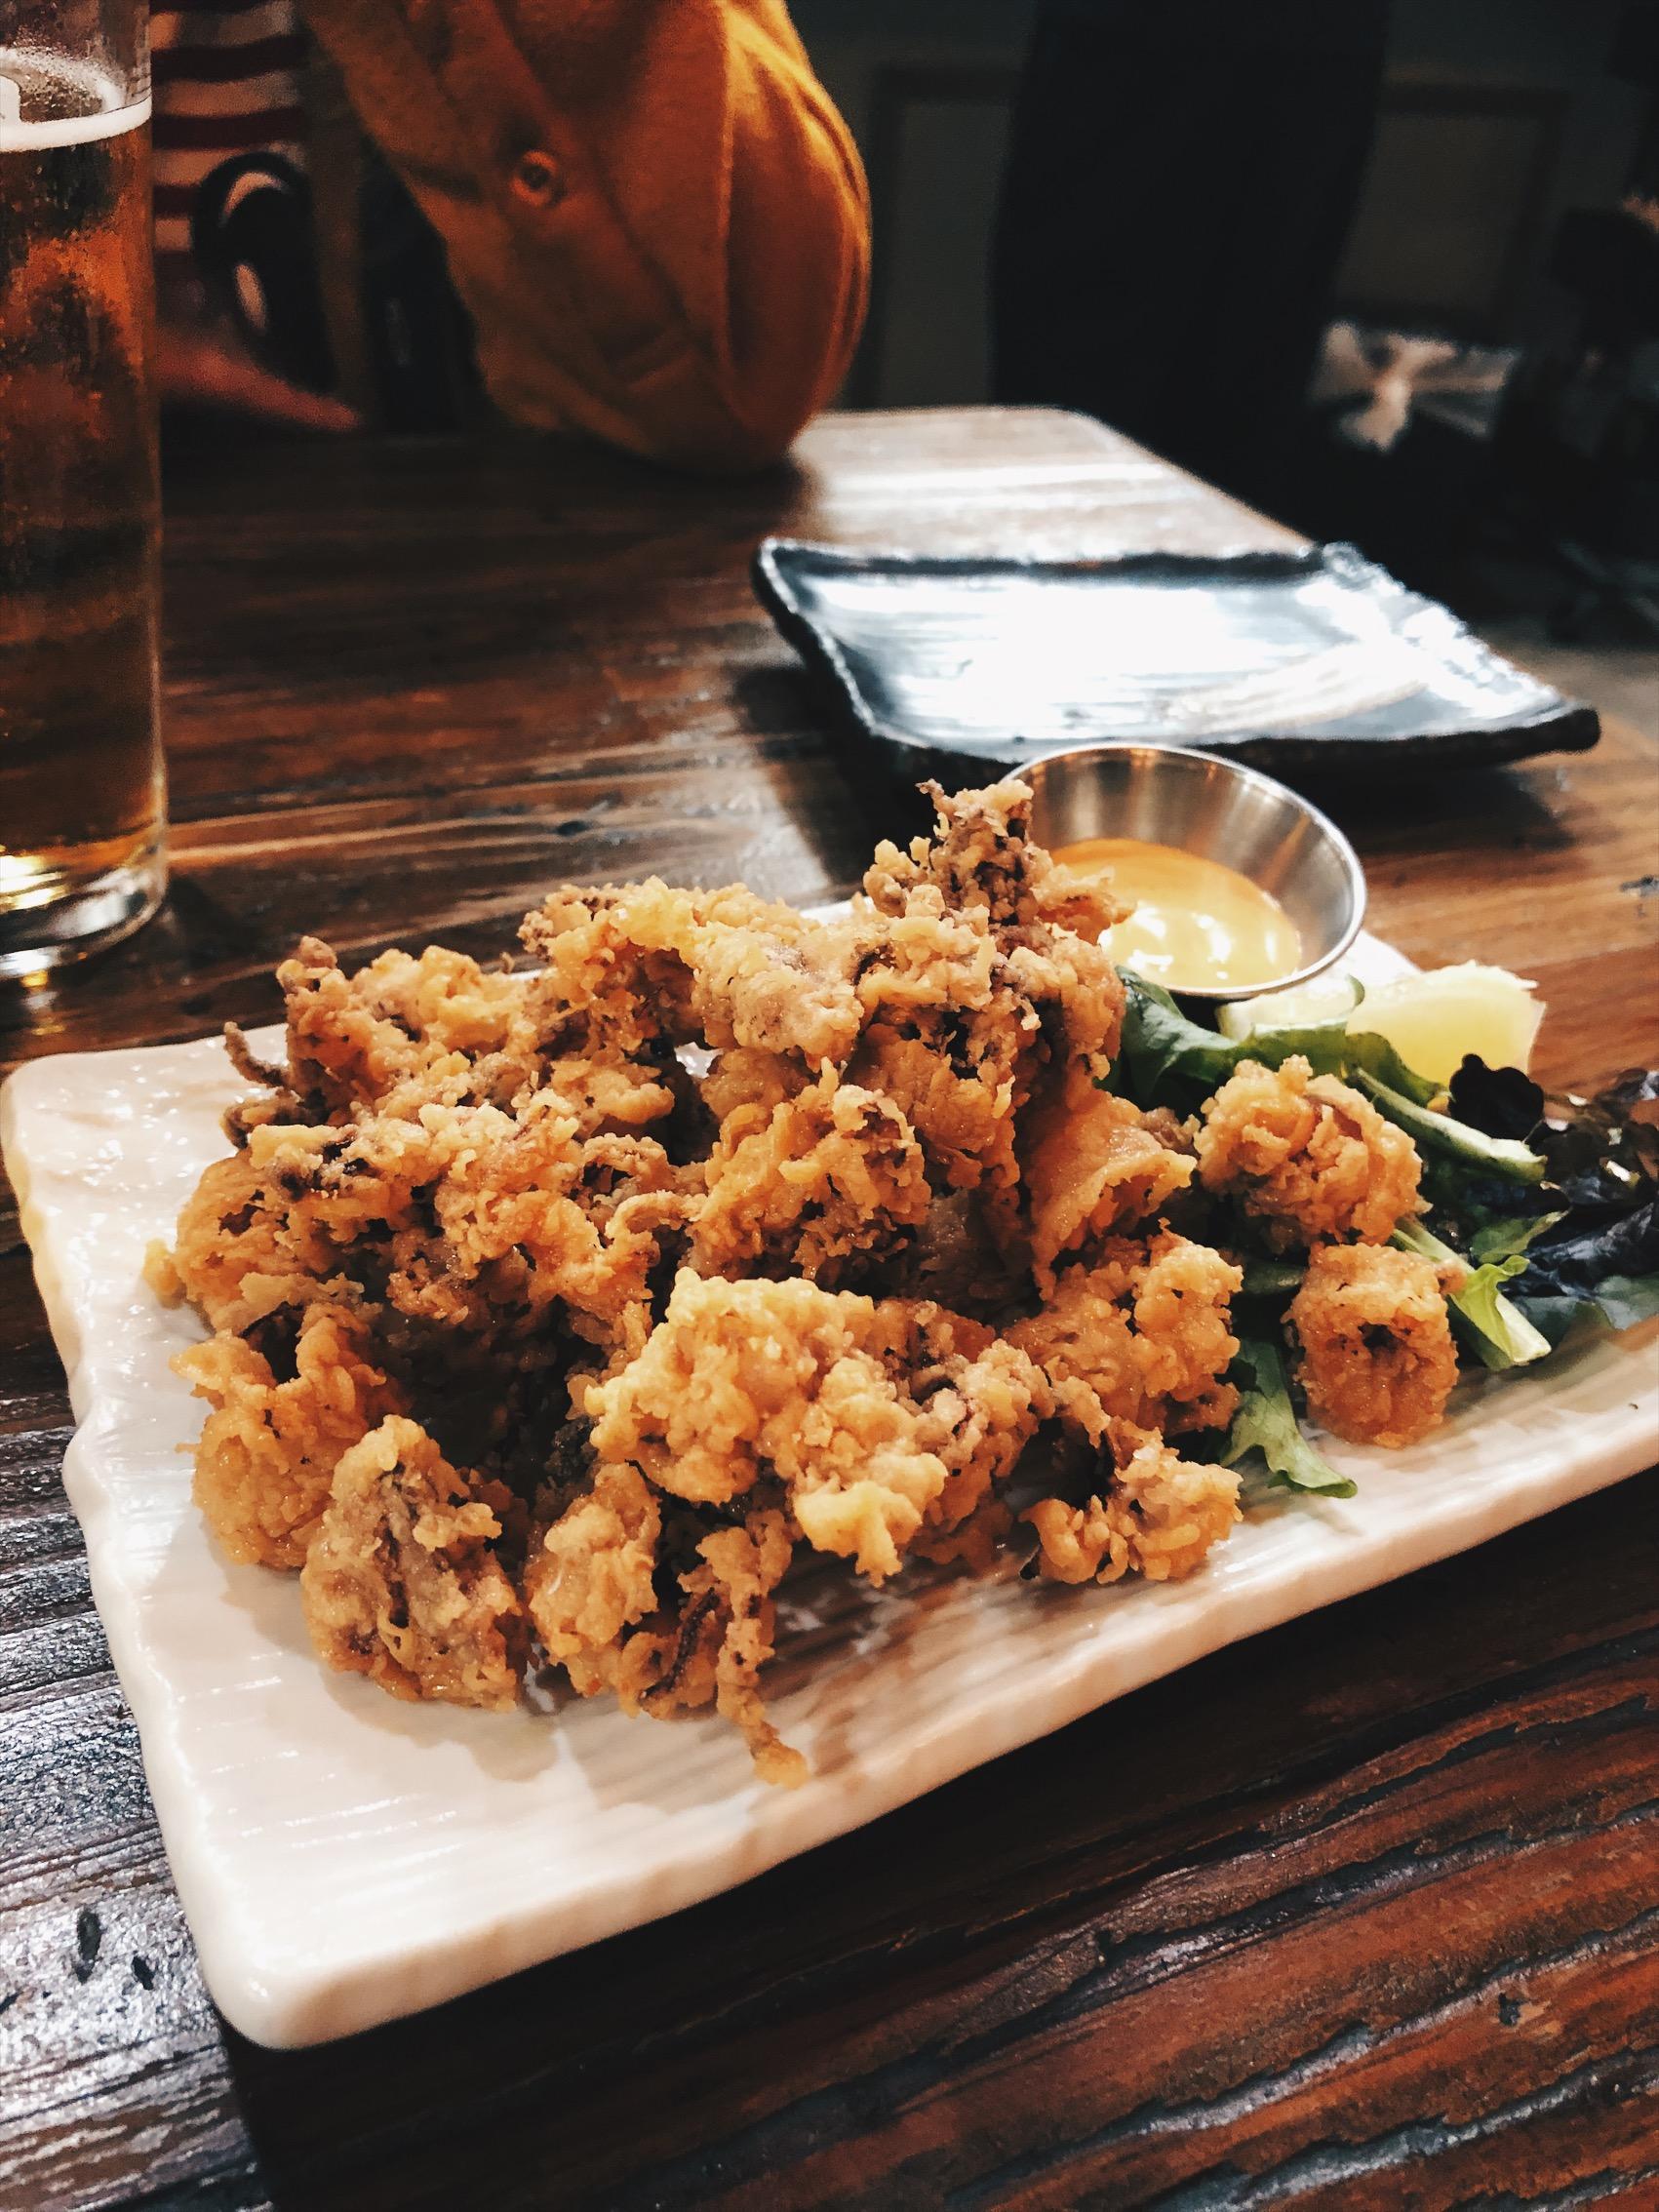 Fried calamari. Any place that serves great Calamari I'll forever fucks with them.